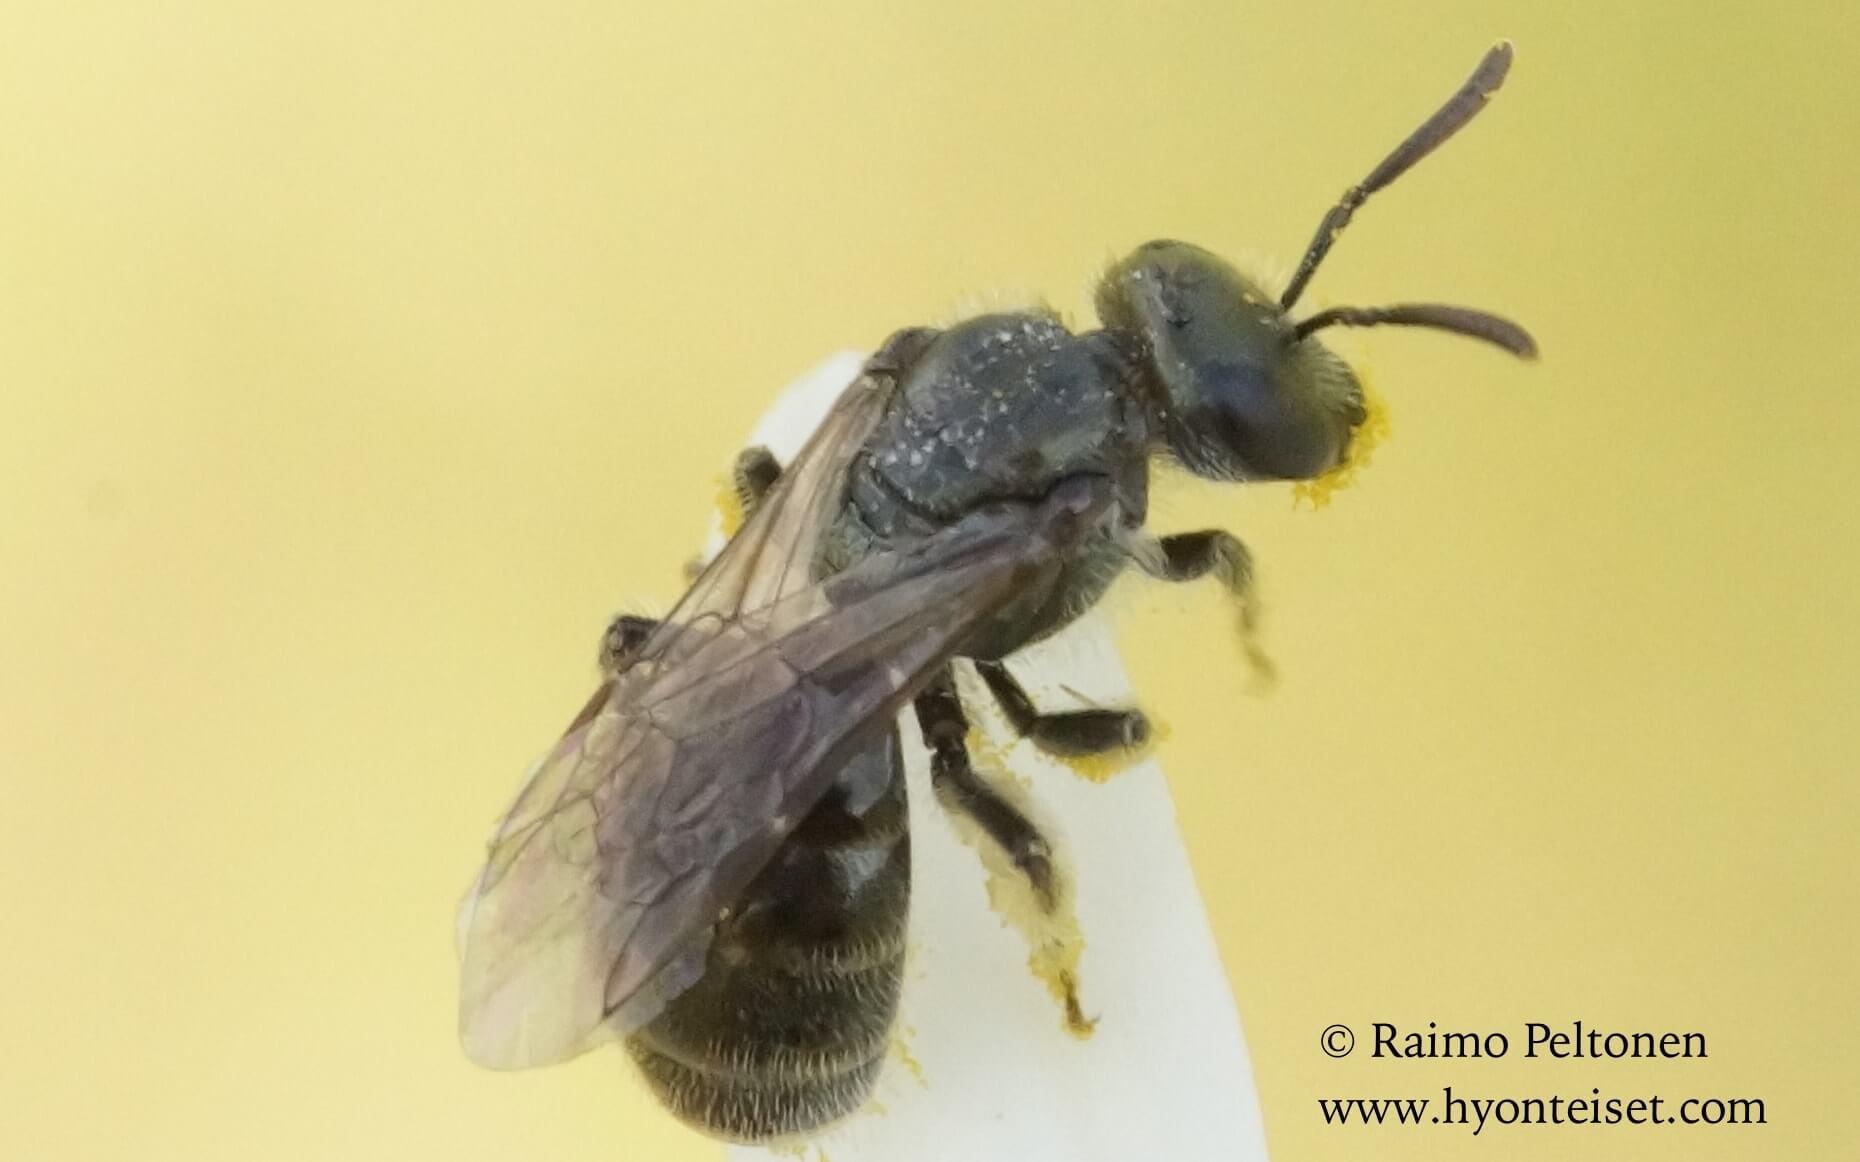 Lasioglossum leucopus-hietavihermehiläinen (det. Juho Paukkunen)